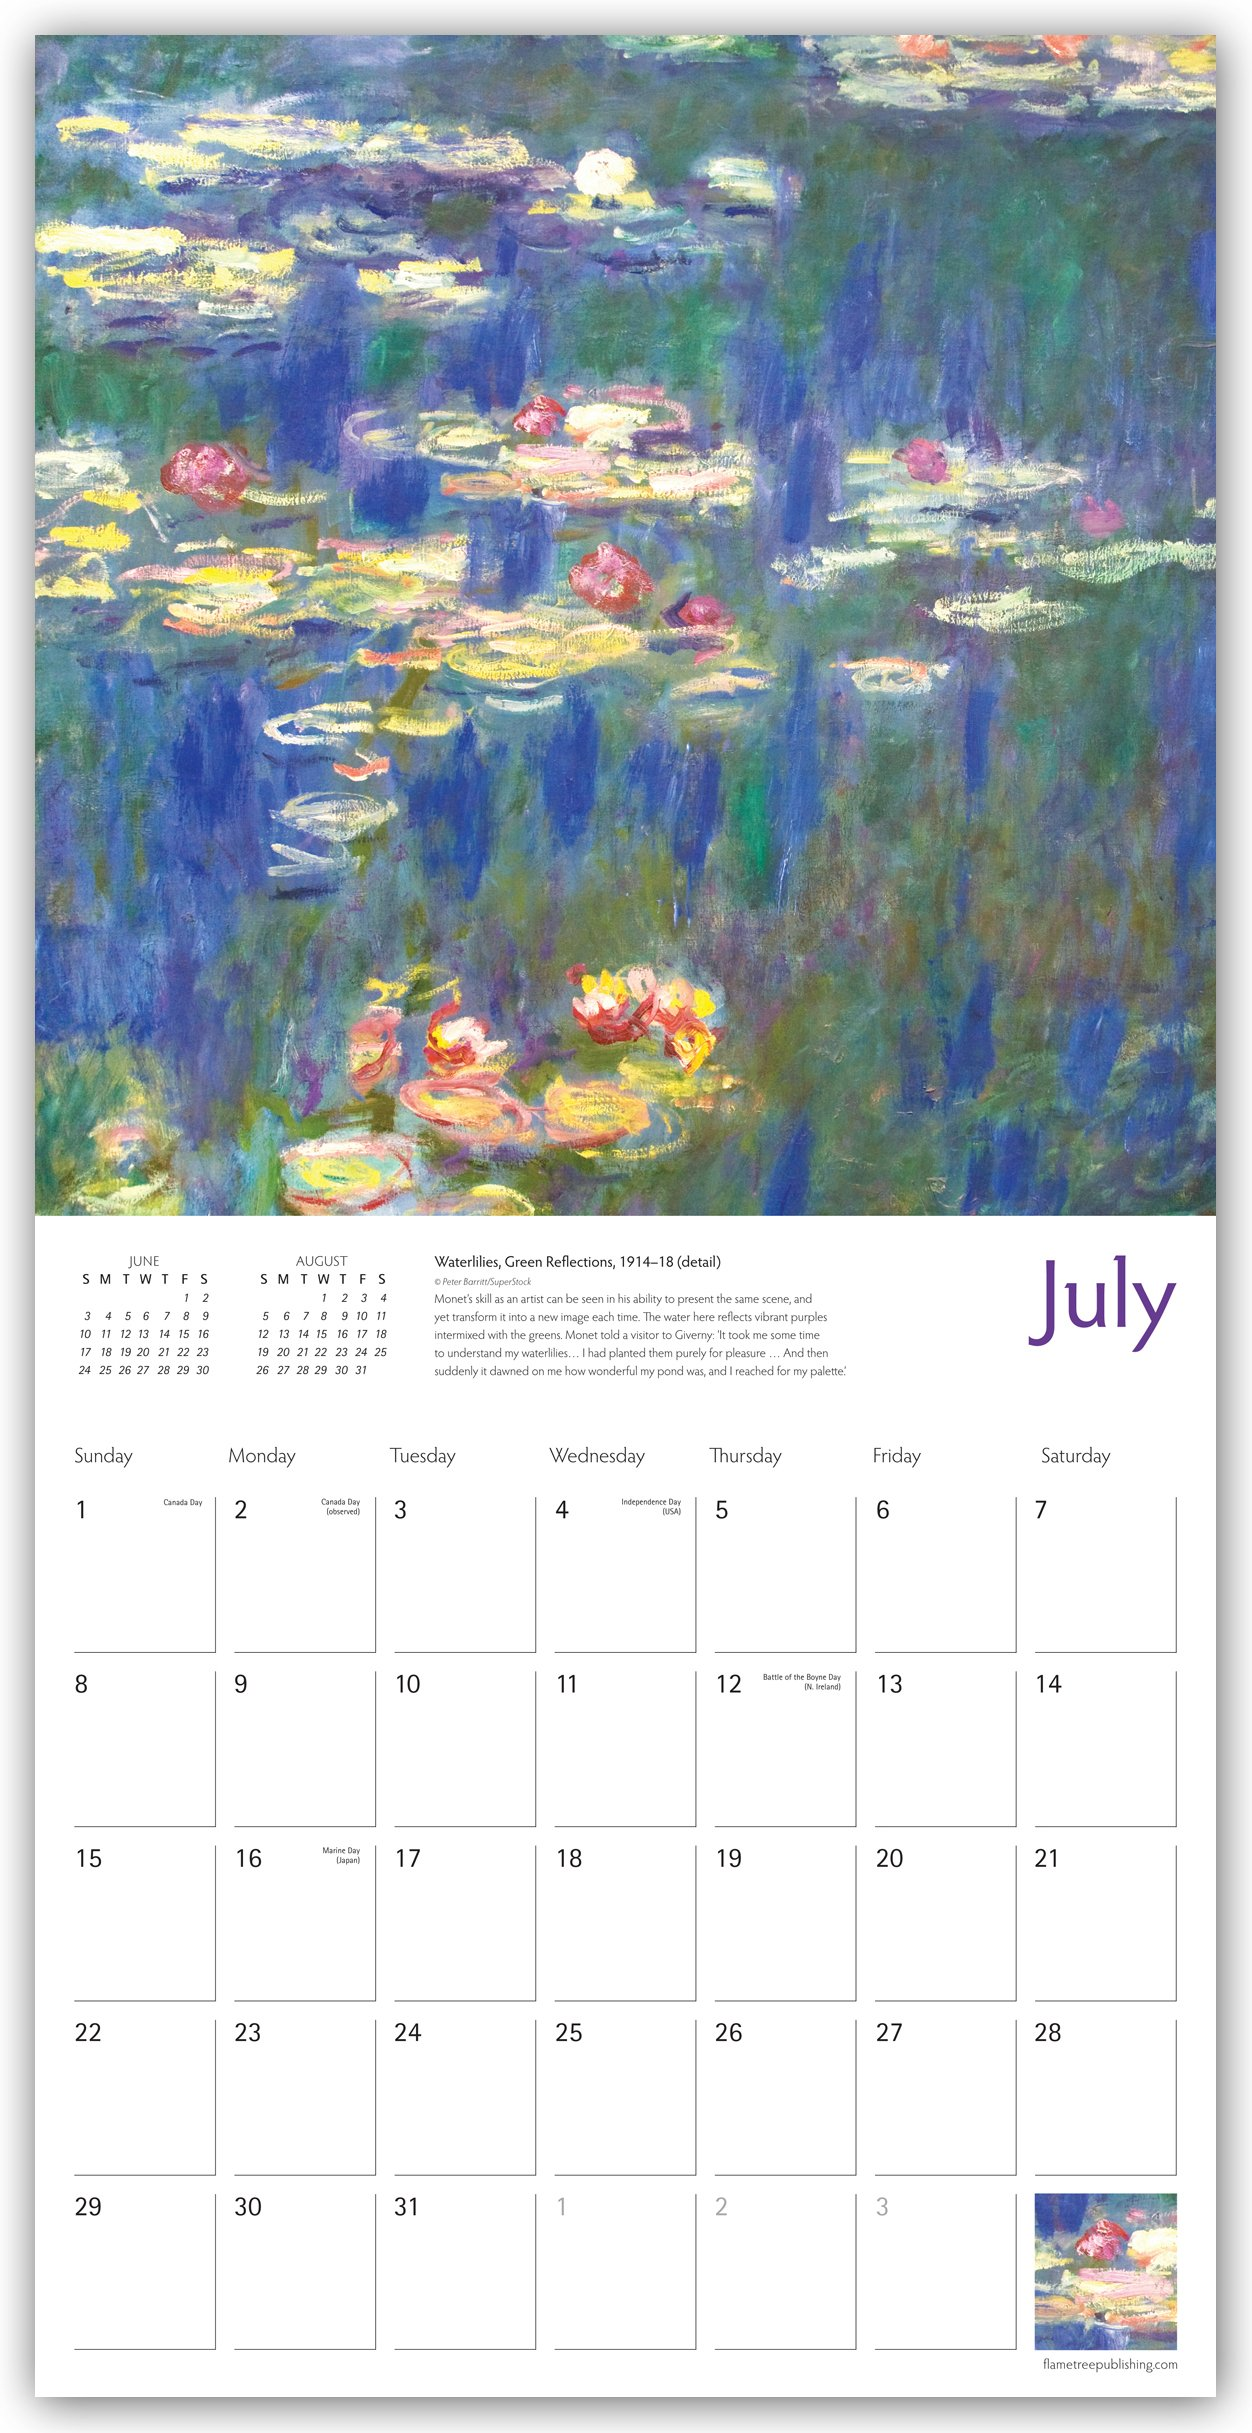 Amazon.com: Monet's Waterlilies Wall Calendar 2018 (Art Calendar)  (9781786642868): Flame Tree Studios, Claude Monet: Books